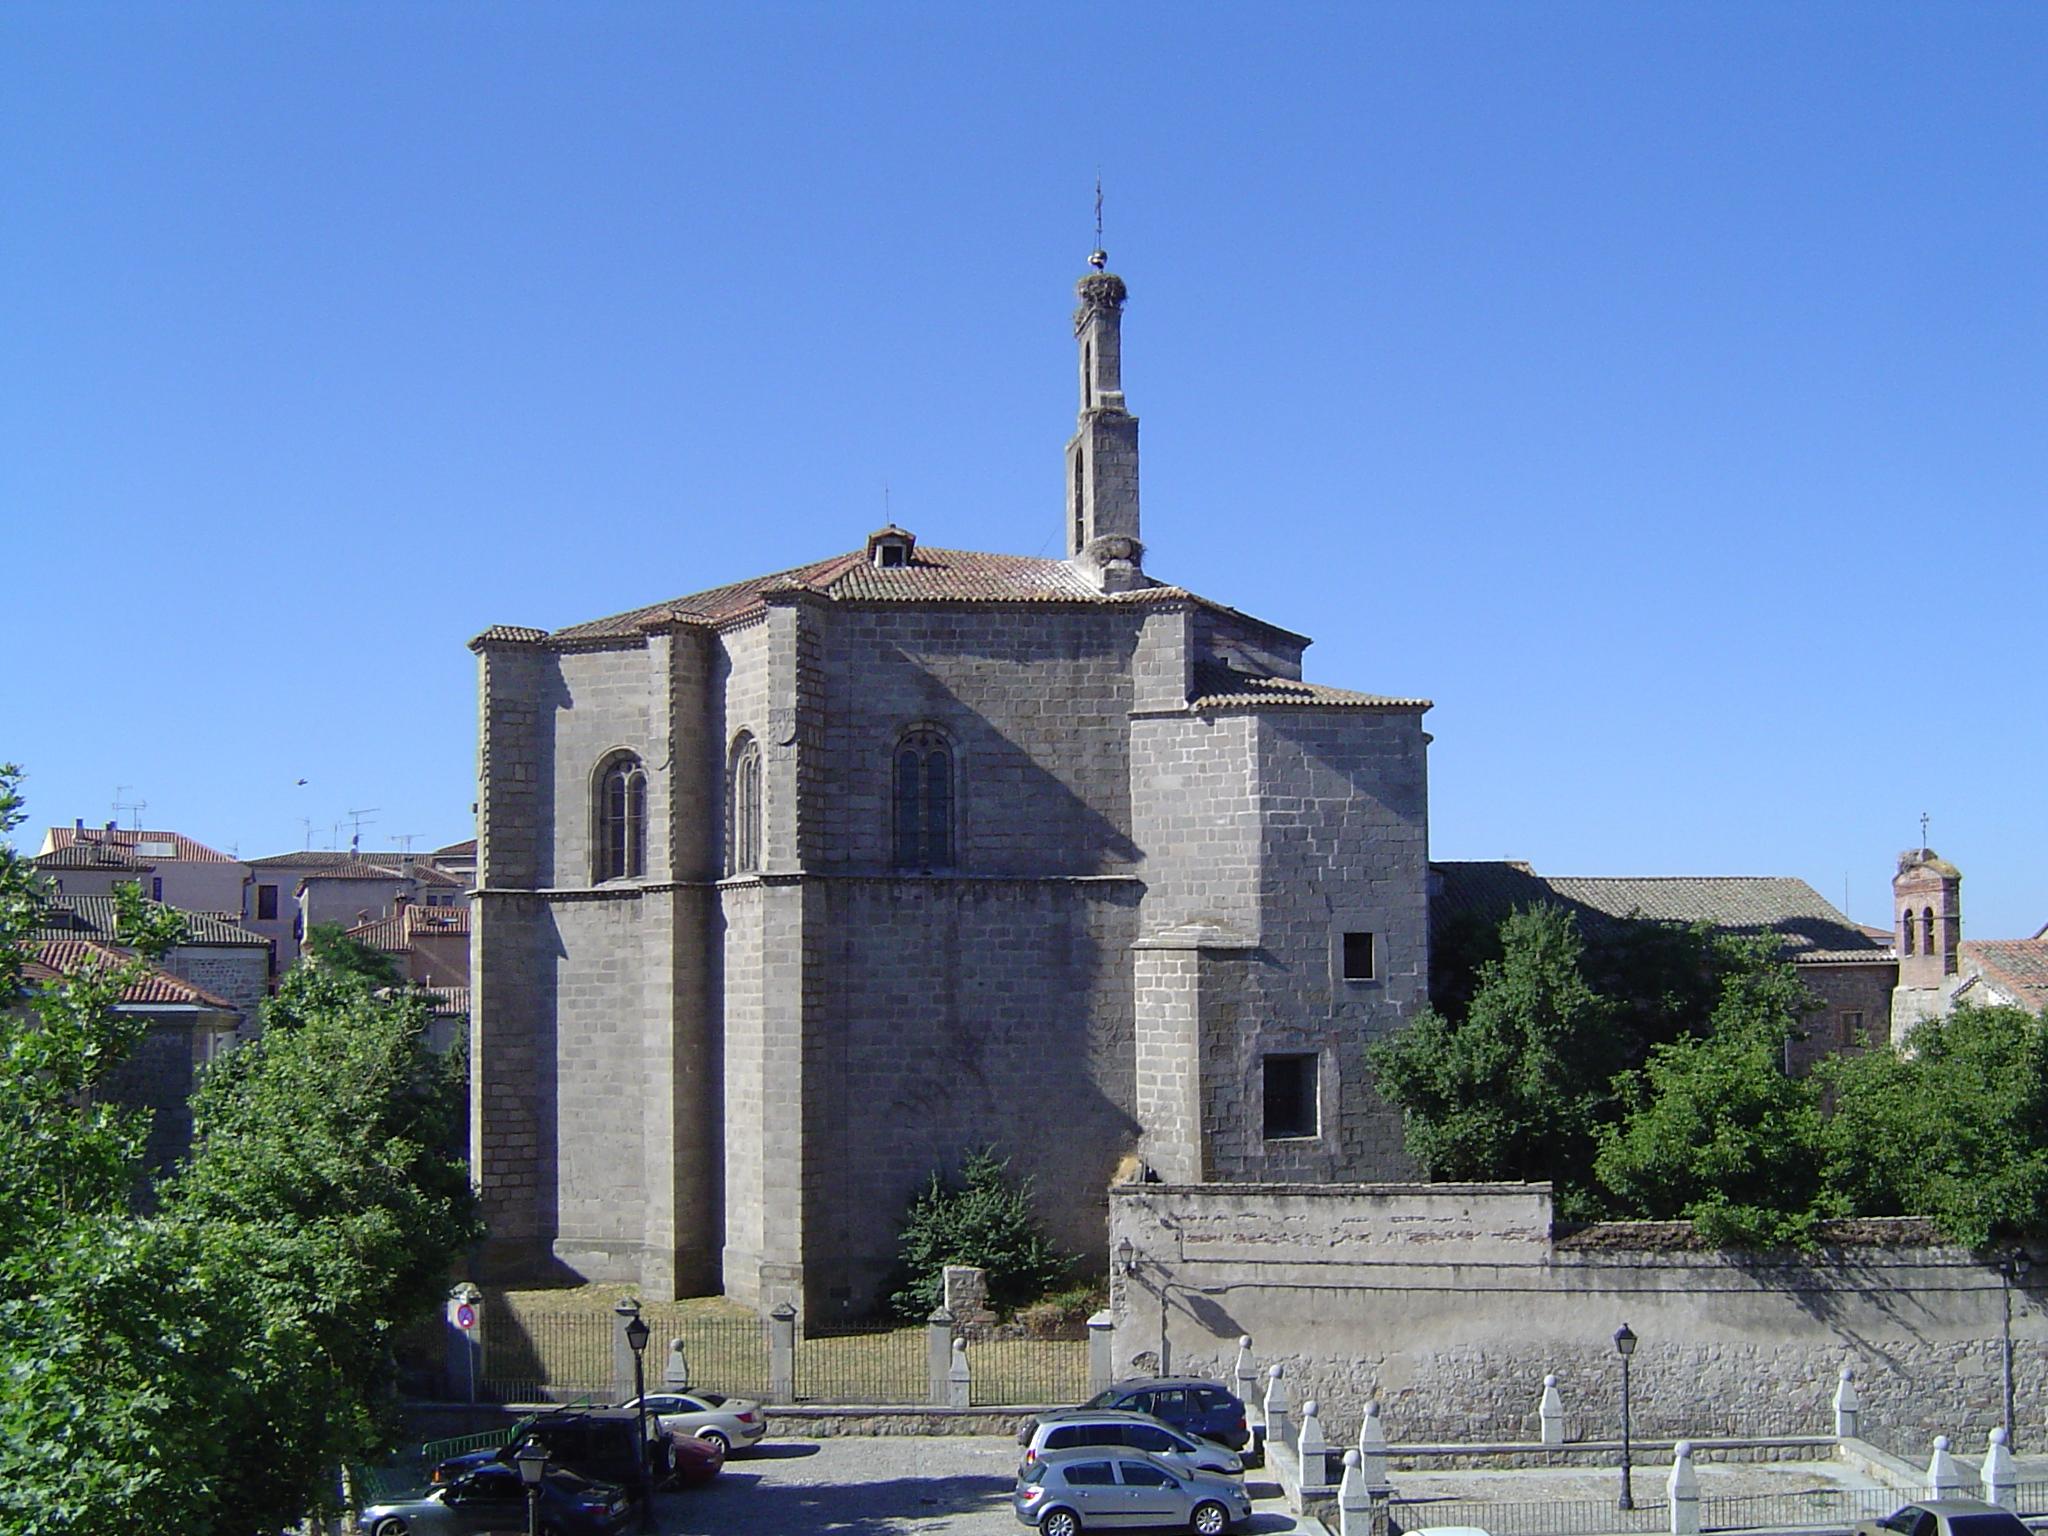 File:Ávila. Capilla de Mosén Rubí.JPG - Wikimedia Commons